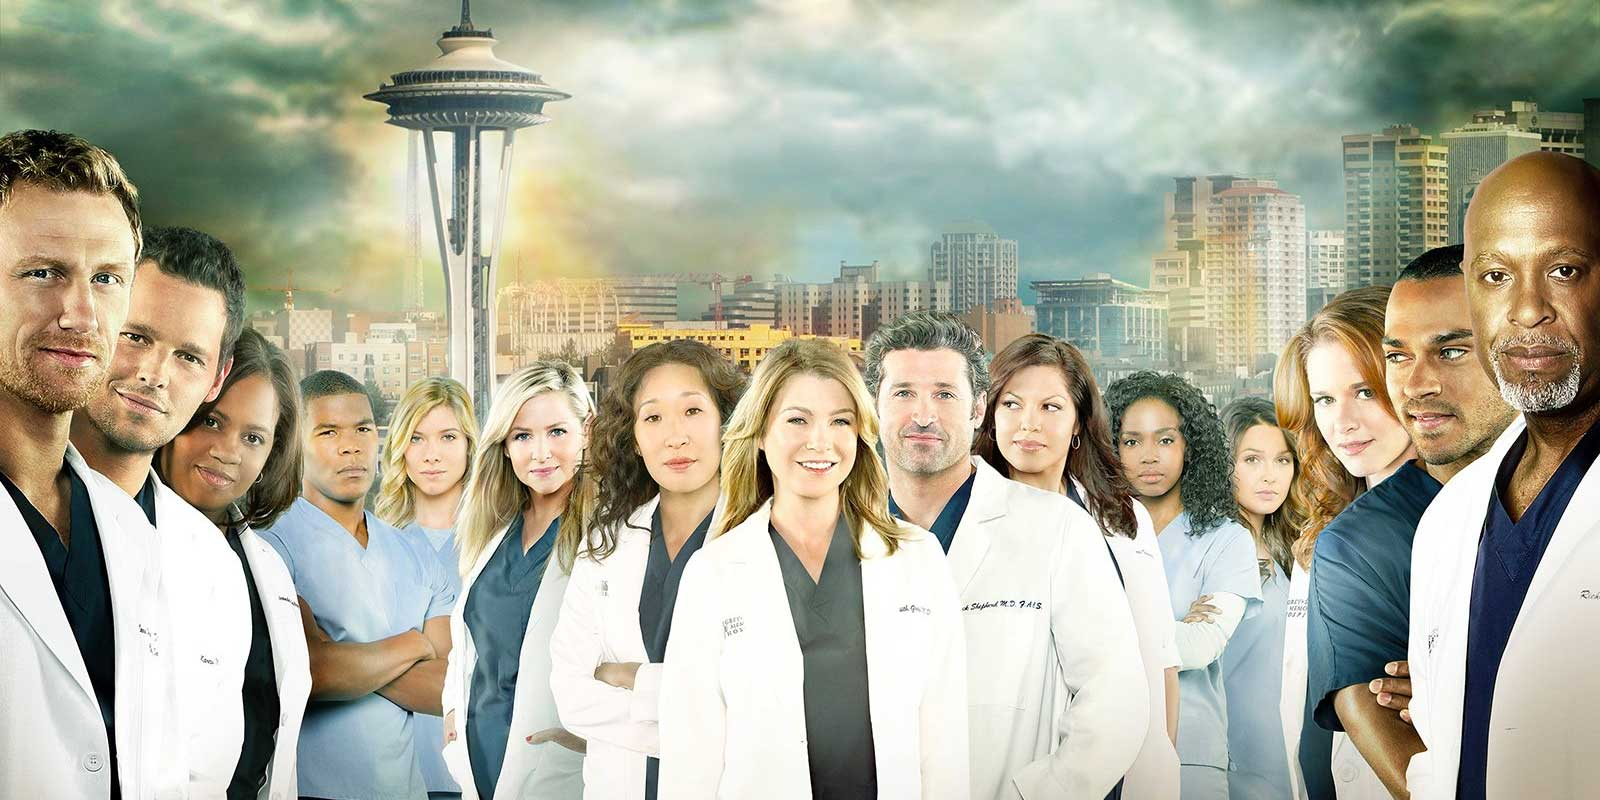 Анатомия страсти (2005) — Grey's Anatomy